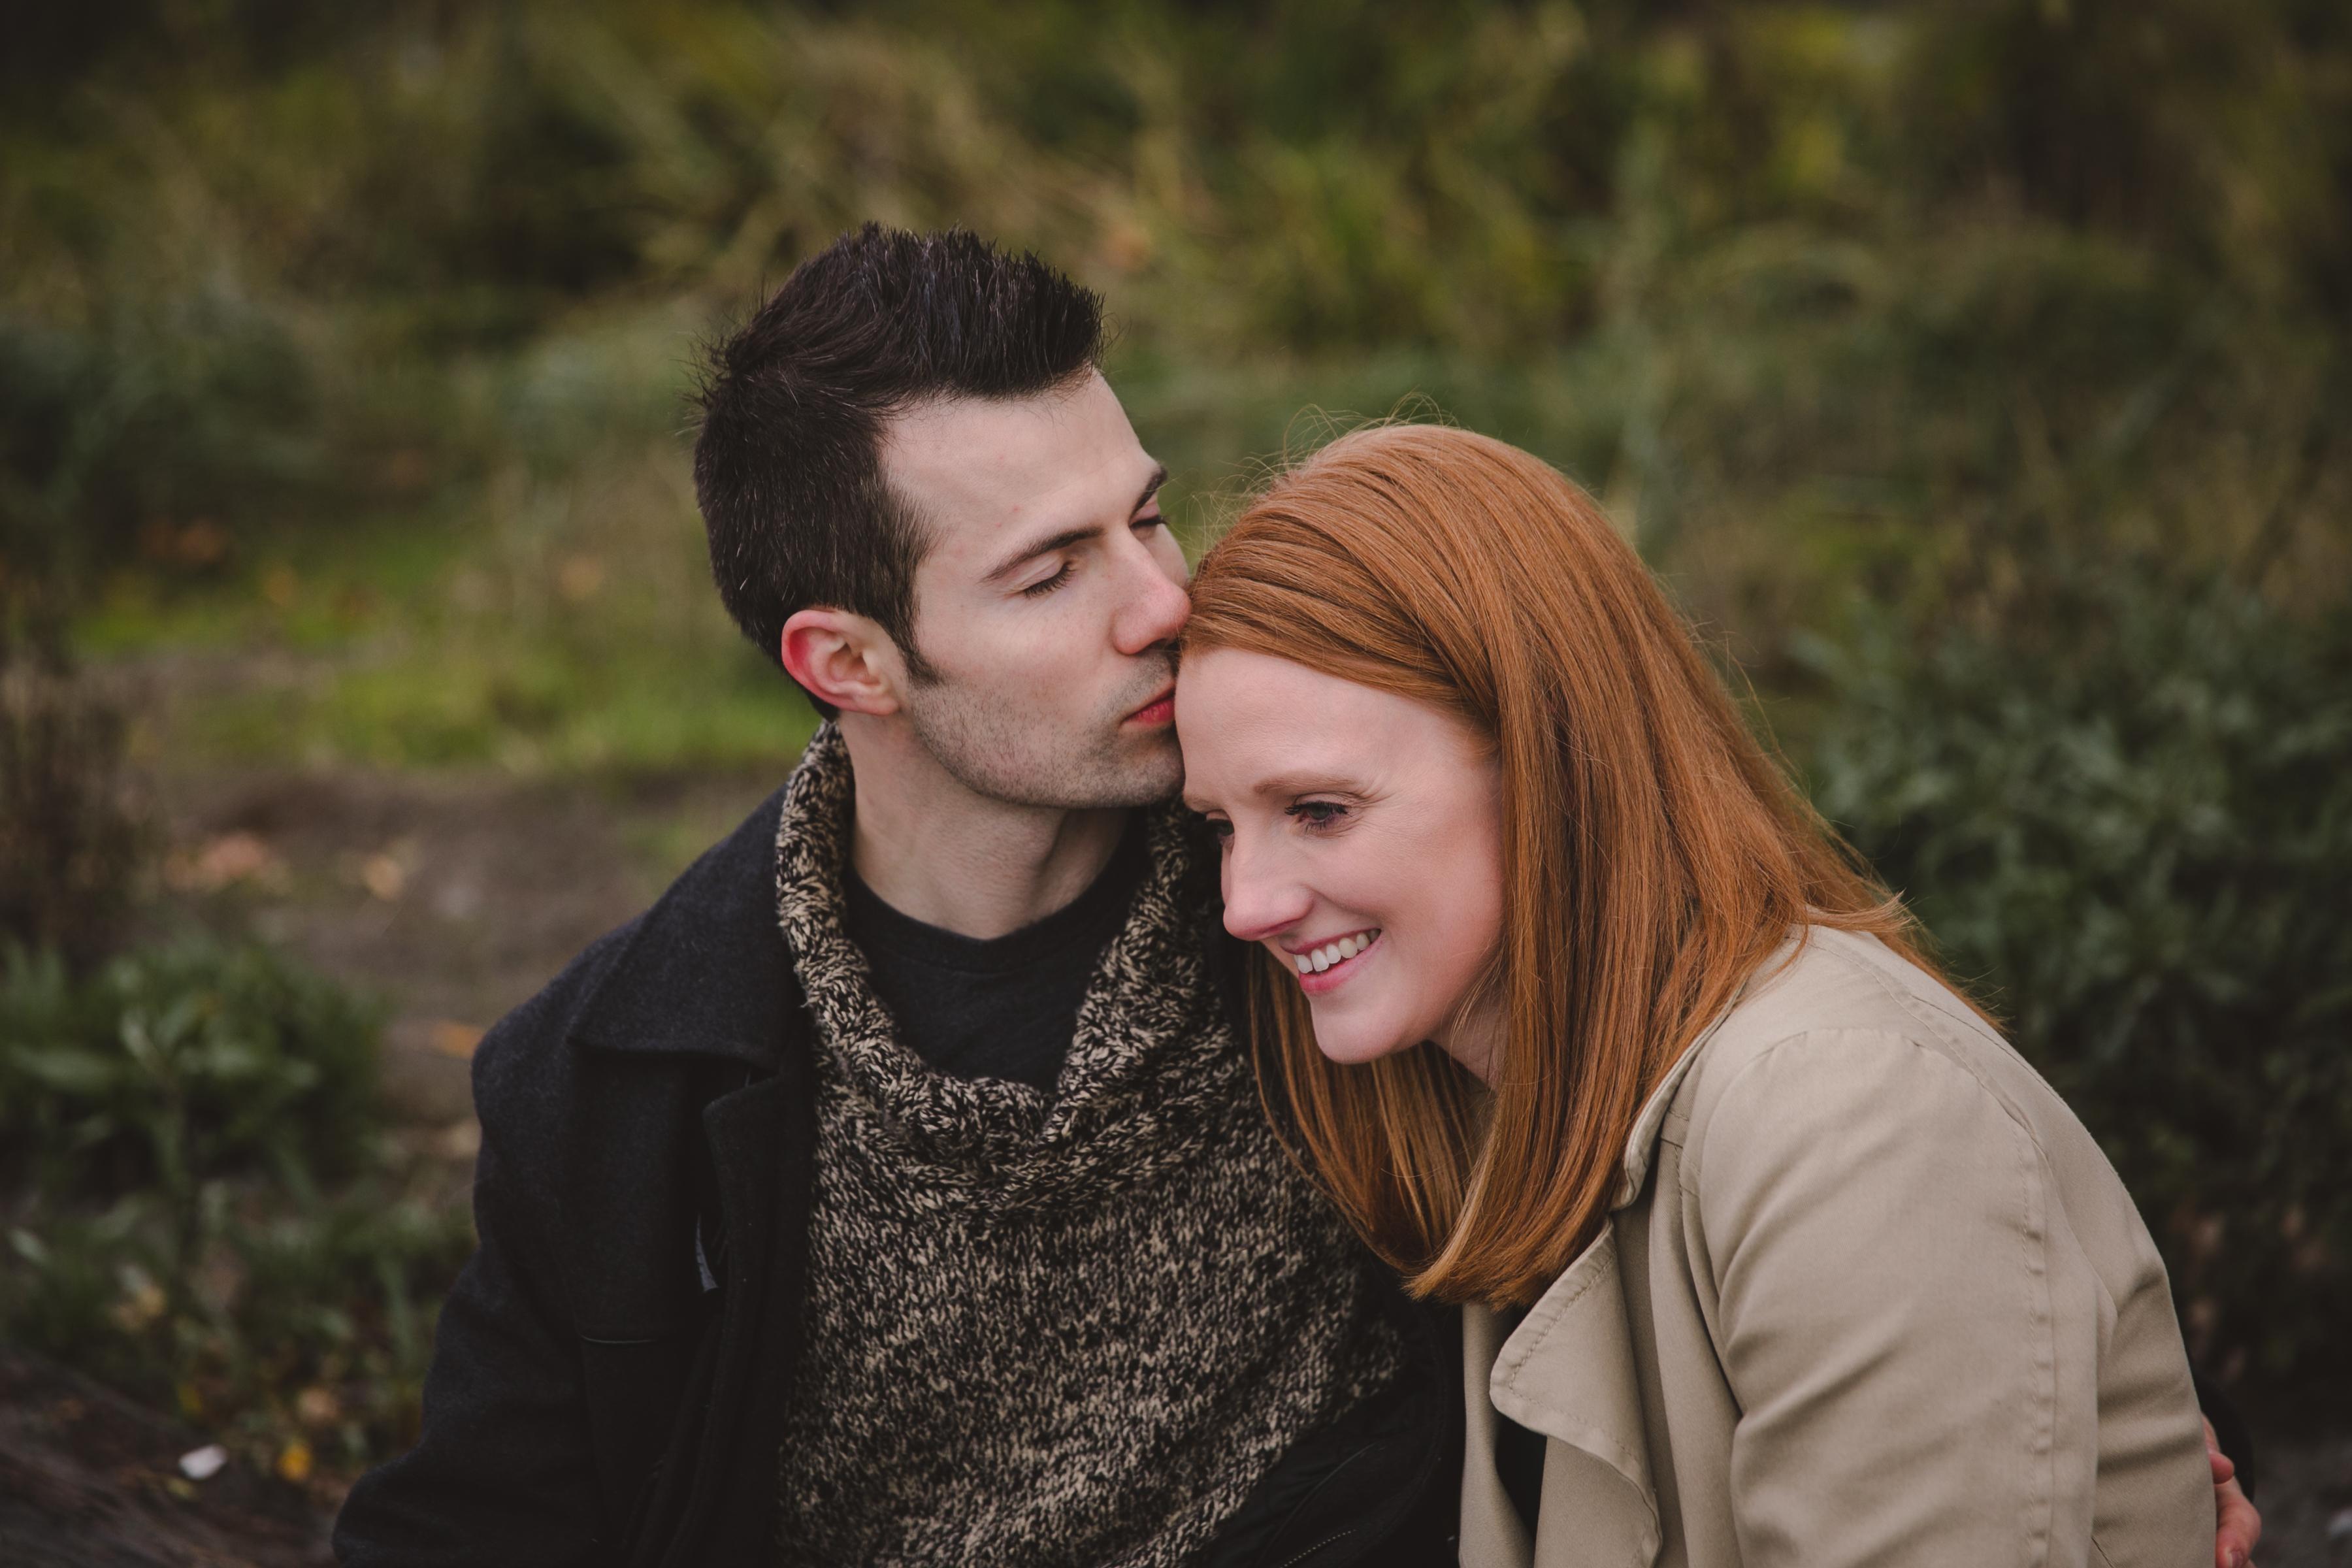 Erin+Nicolas_engagement_Tarigunstonephot